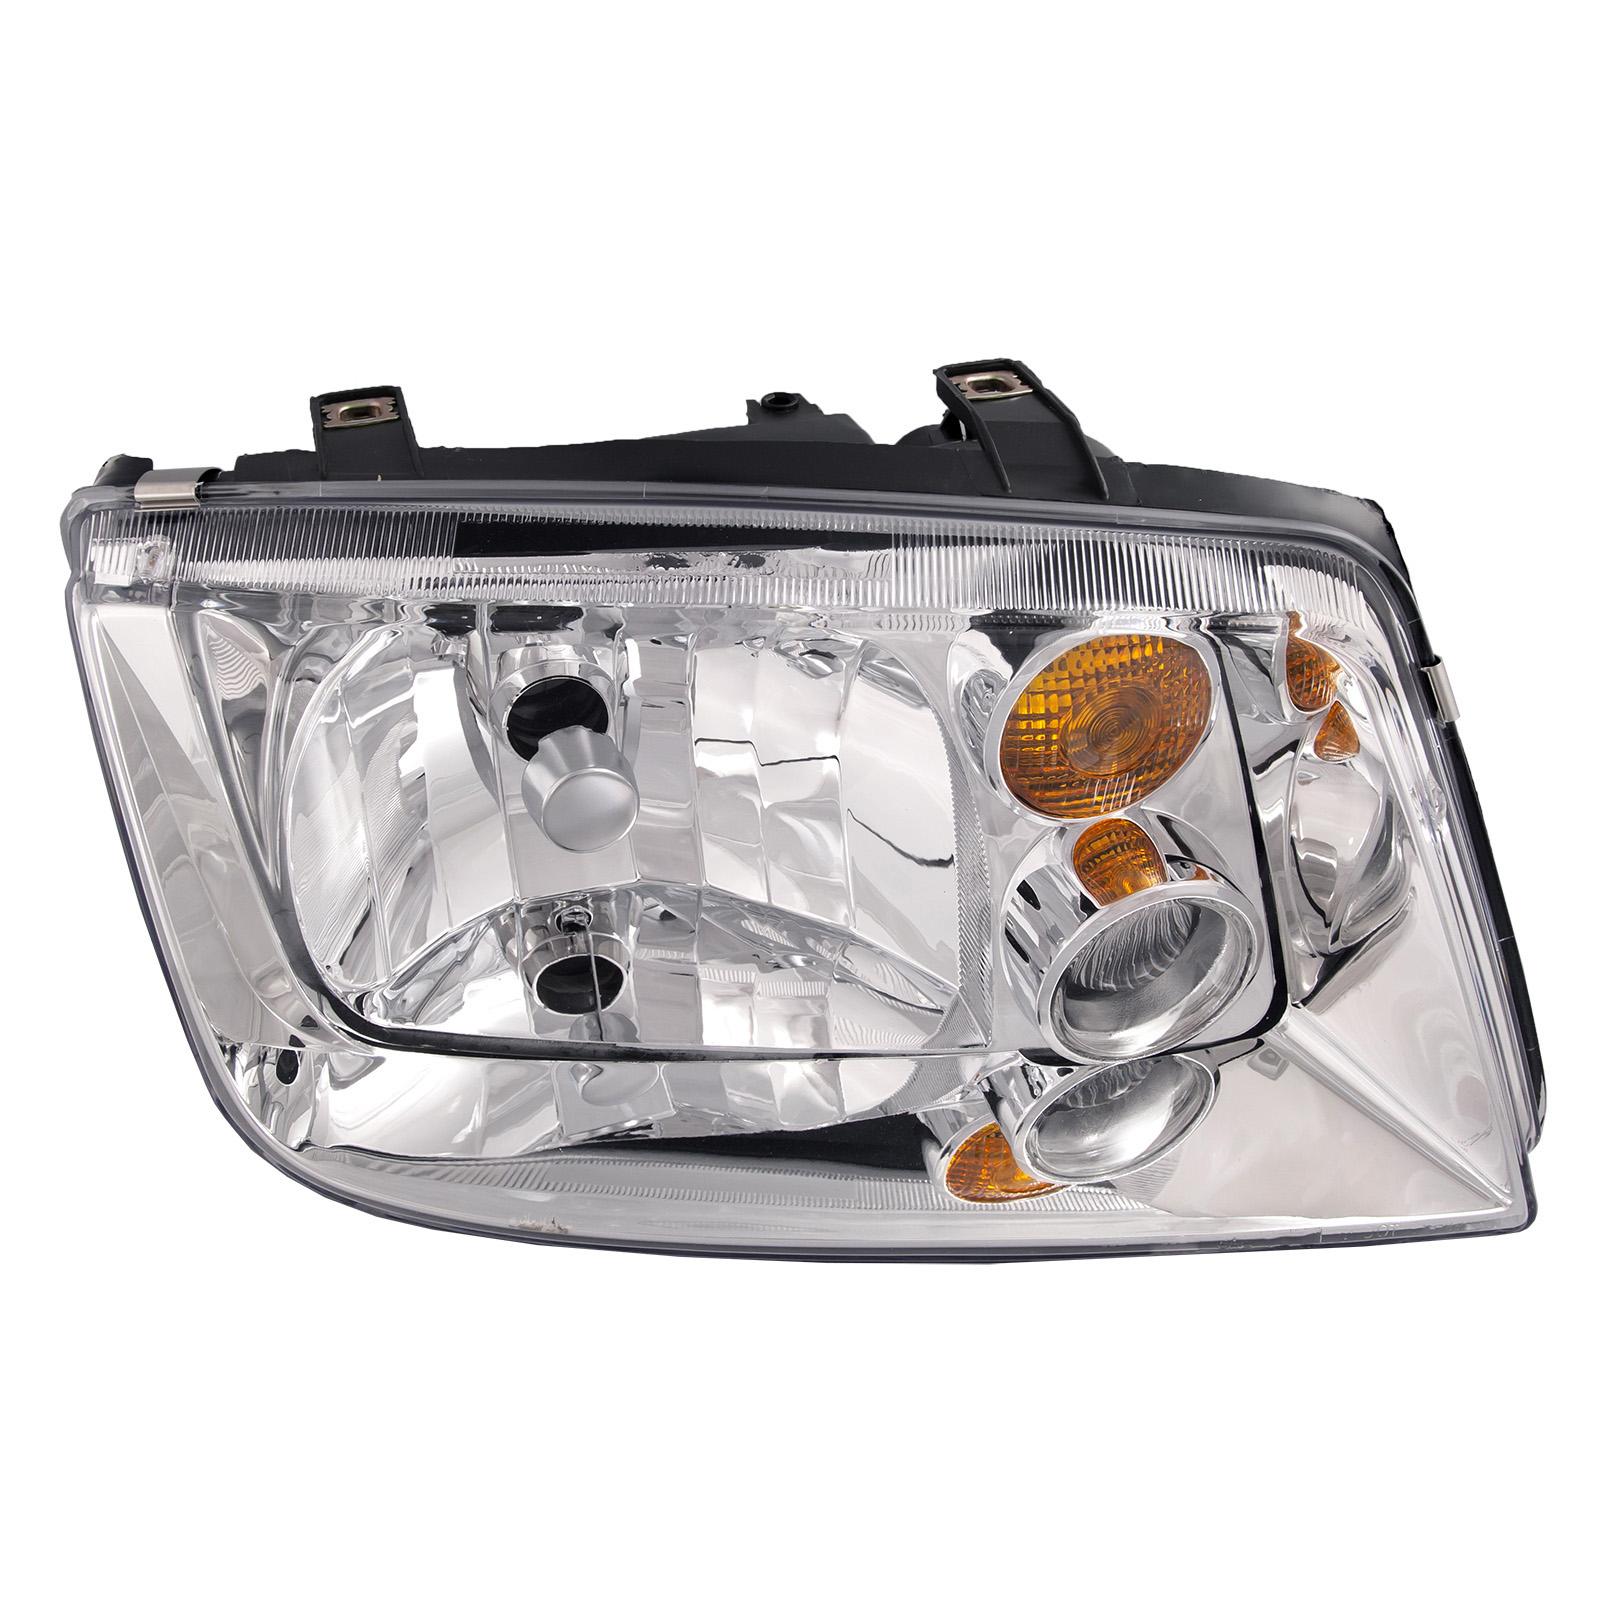 Details About Fits 02 05 Volkswagen Vw Jetta Headlight W O Fog Lamp Halogen Right Side